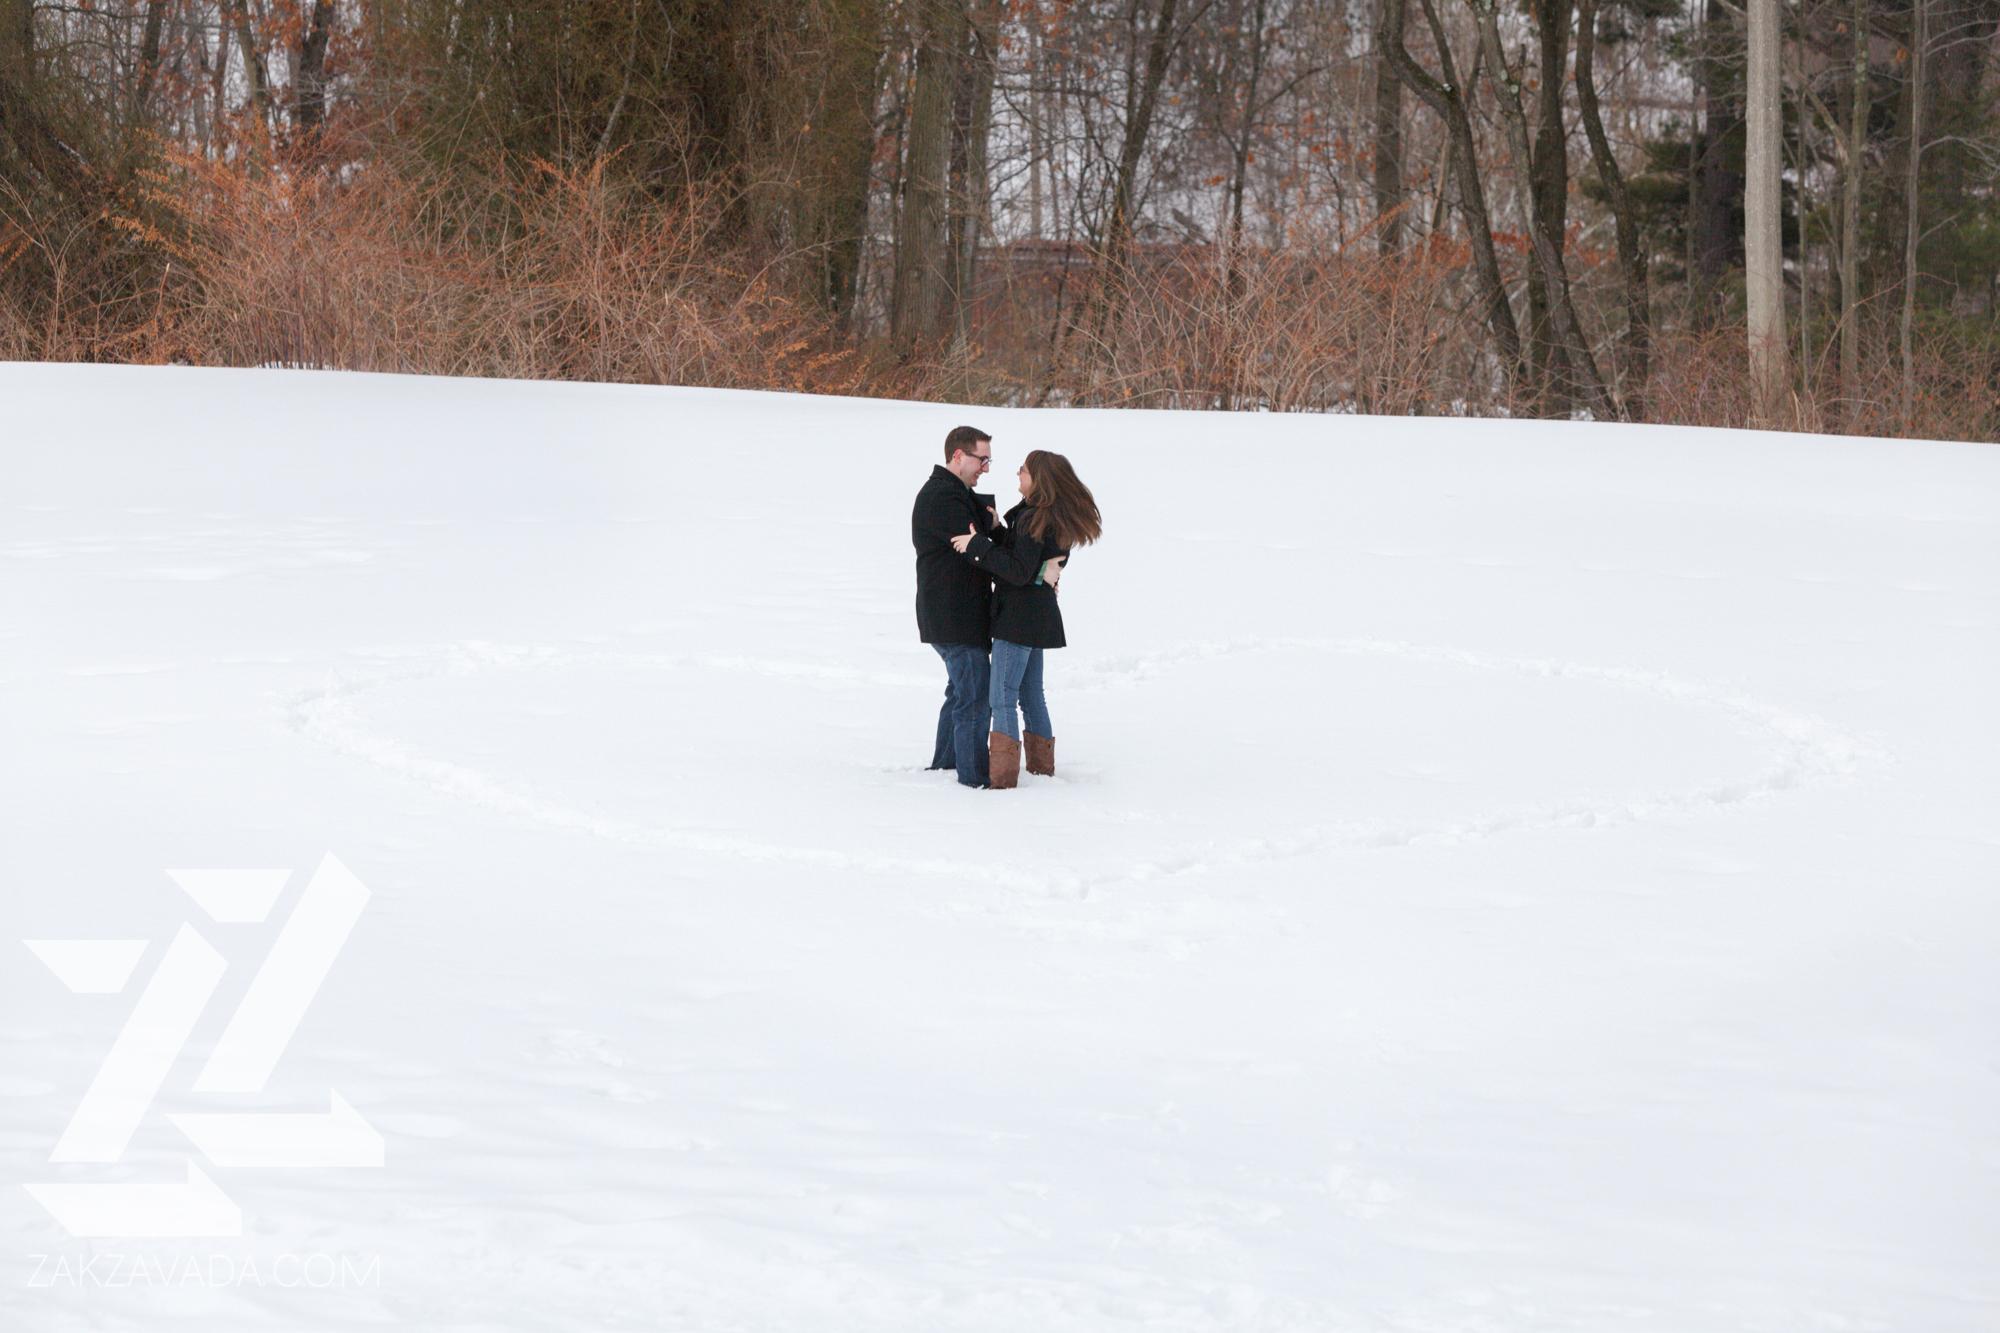 scranton-wedding-photography-zak-zavada-2015.03-mariDustinEngagement-2015-3.jpg